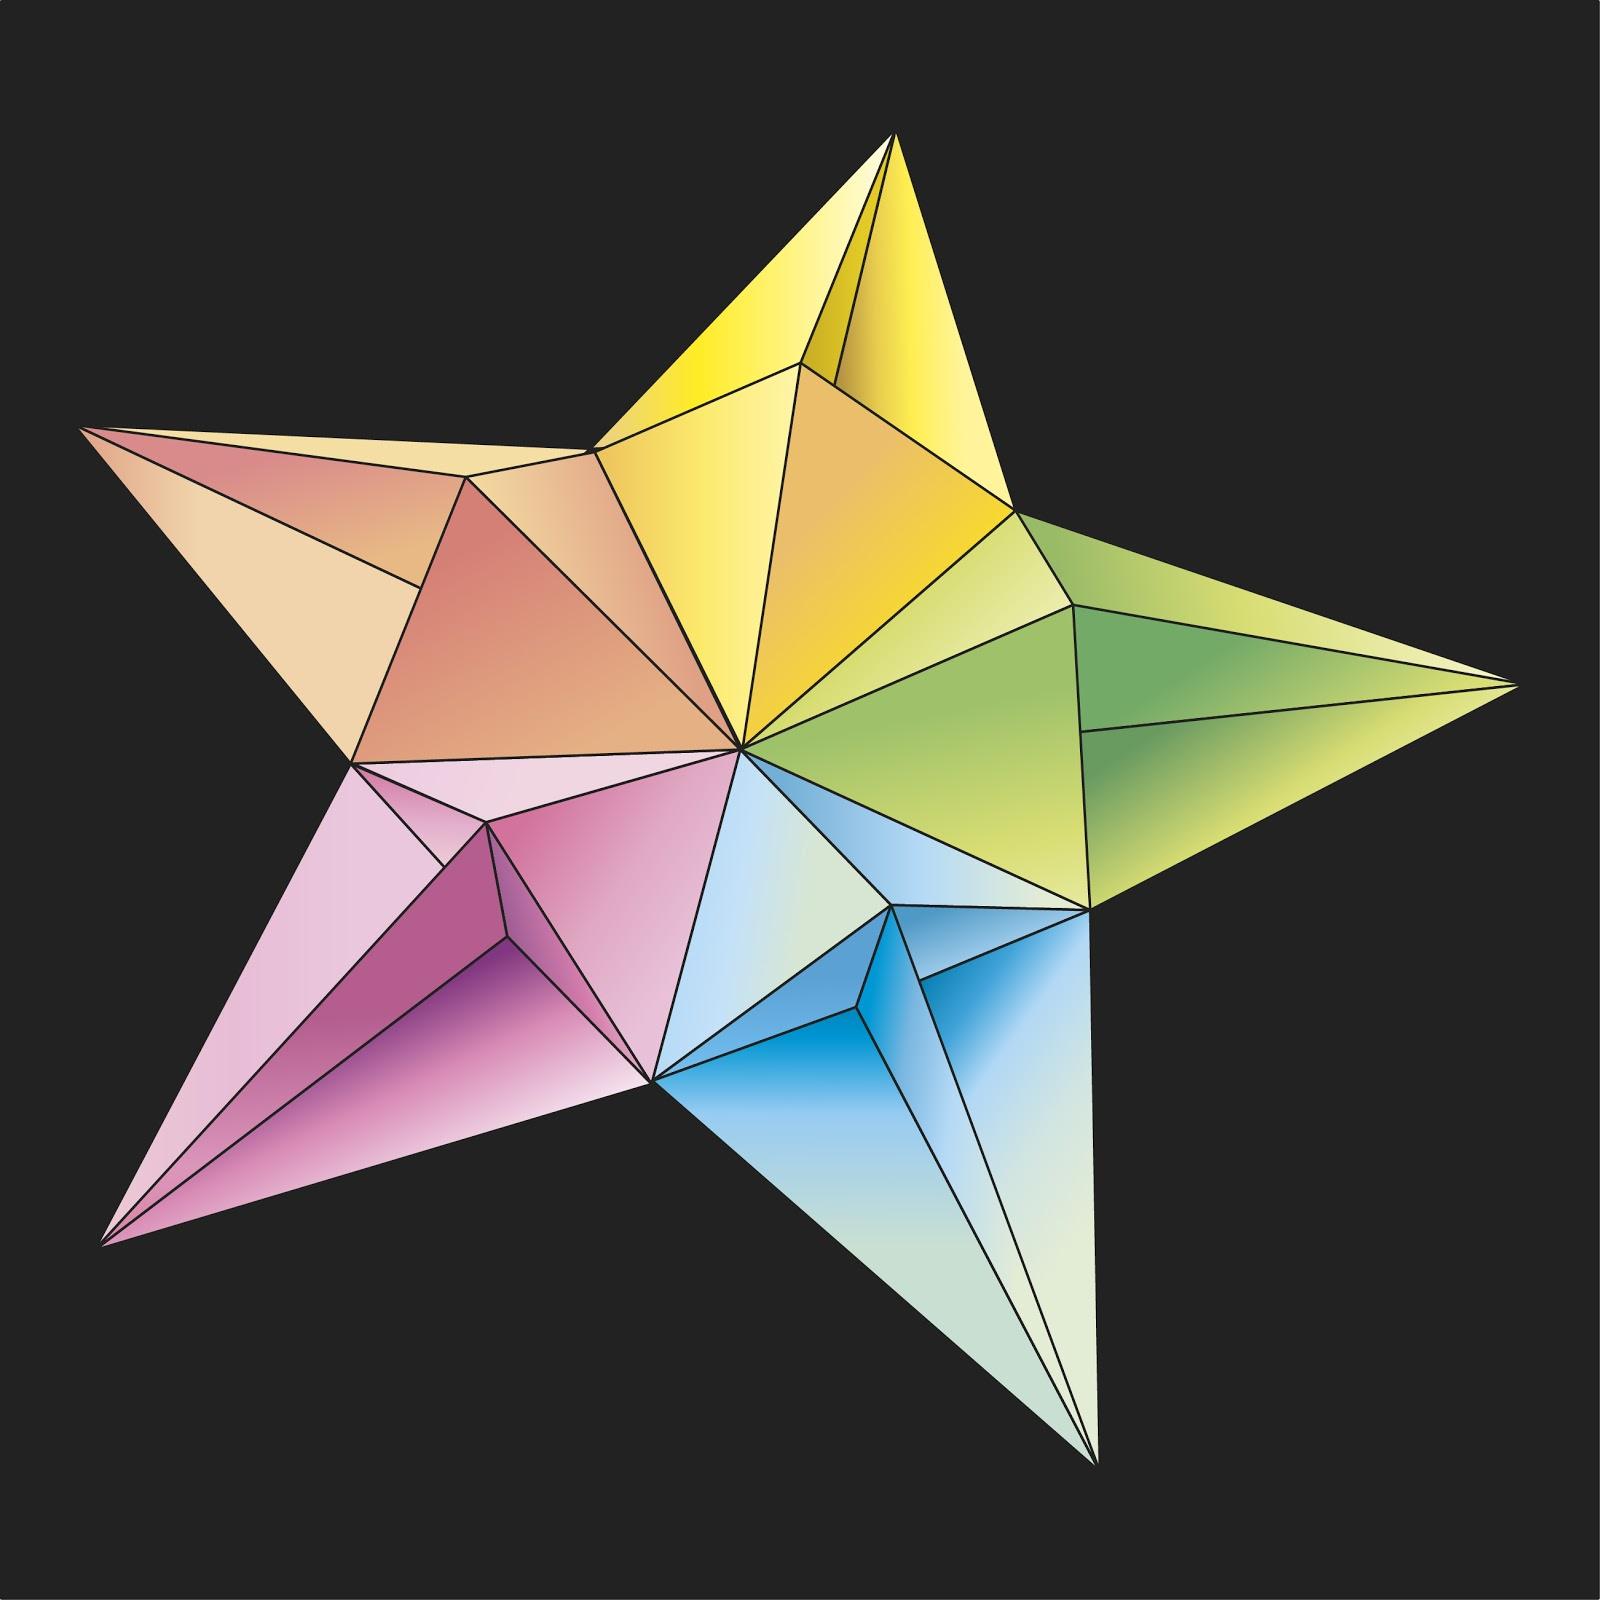 Origami poesie di carta stella diamante 1 francesco guarnieri